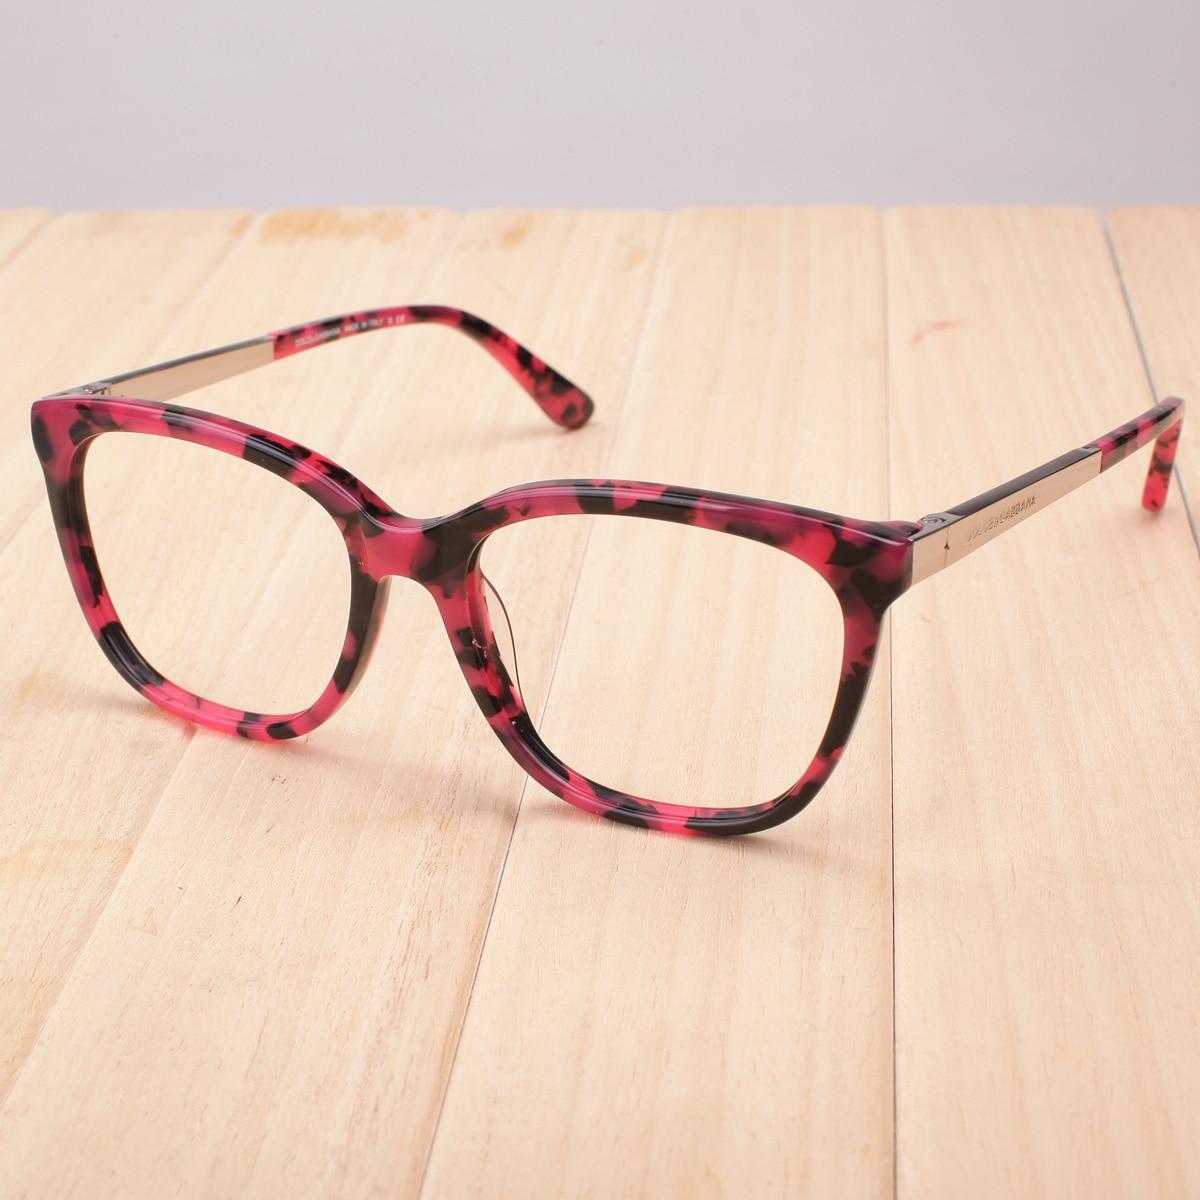 New 2014 Fashion optical eyeglasses spectacle frame men ...